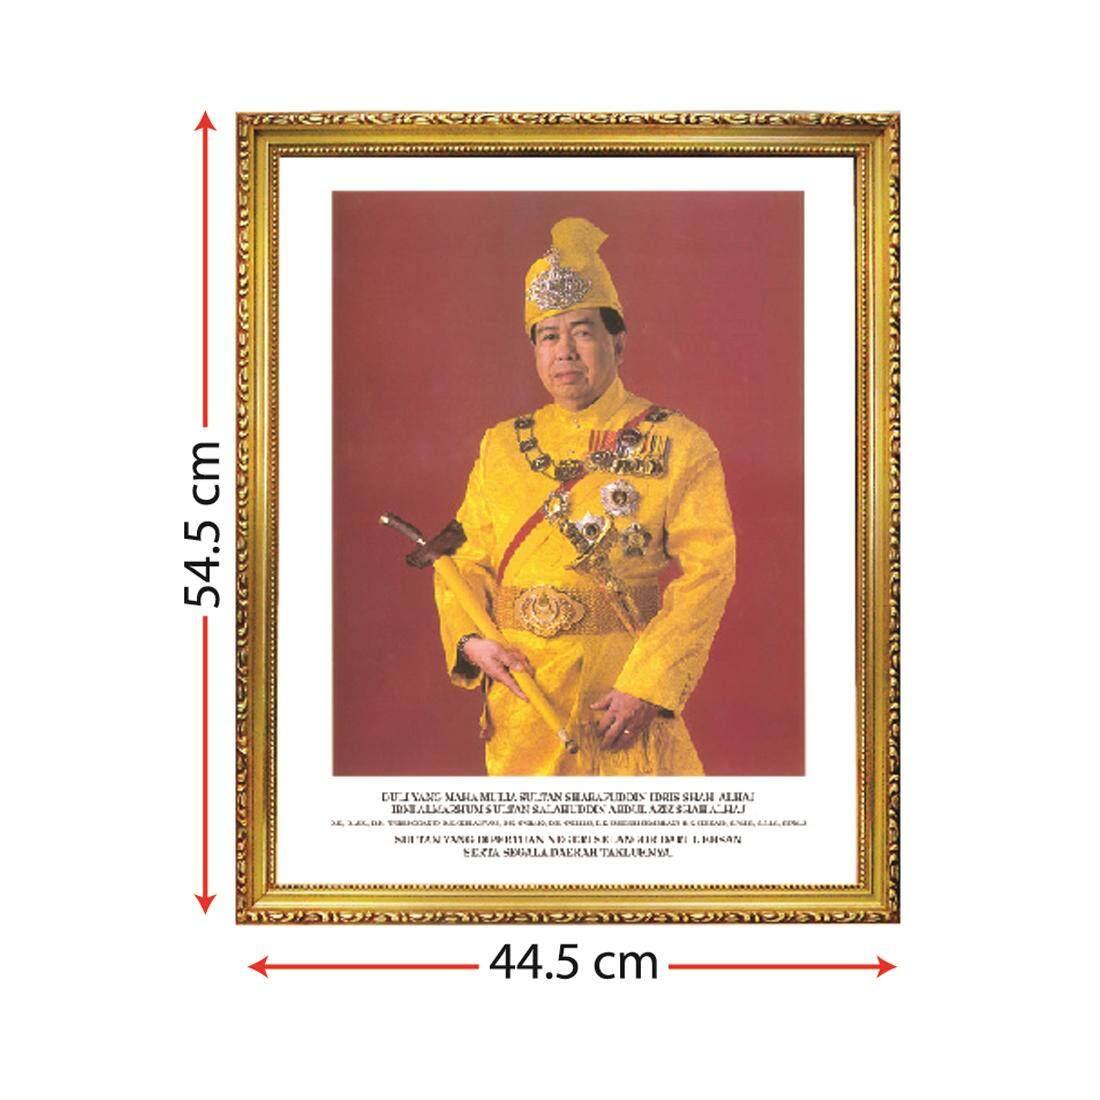 Bingkai Potret Sultan Selangor, Sultan Selangor Portrait